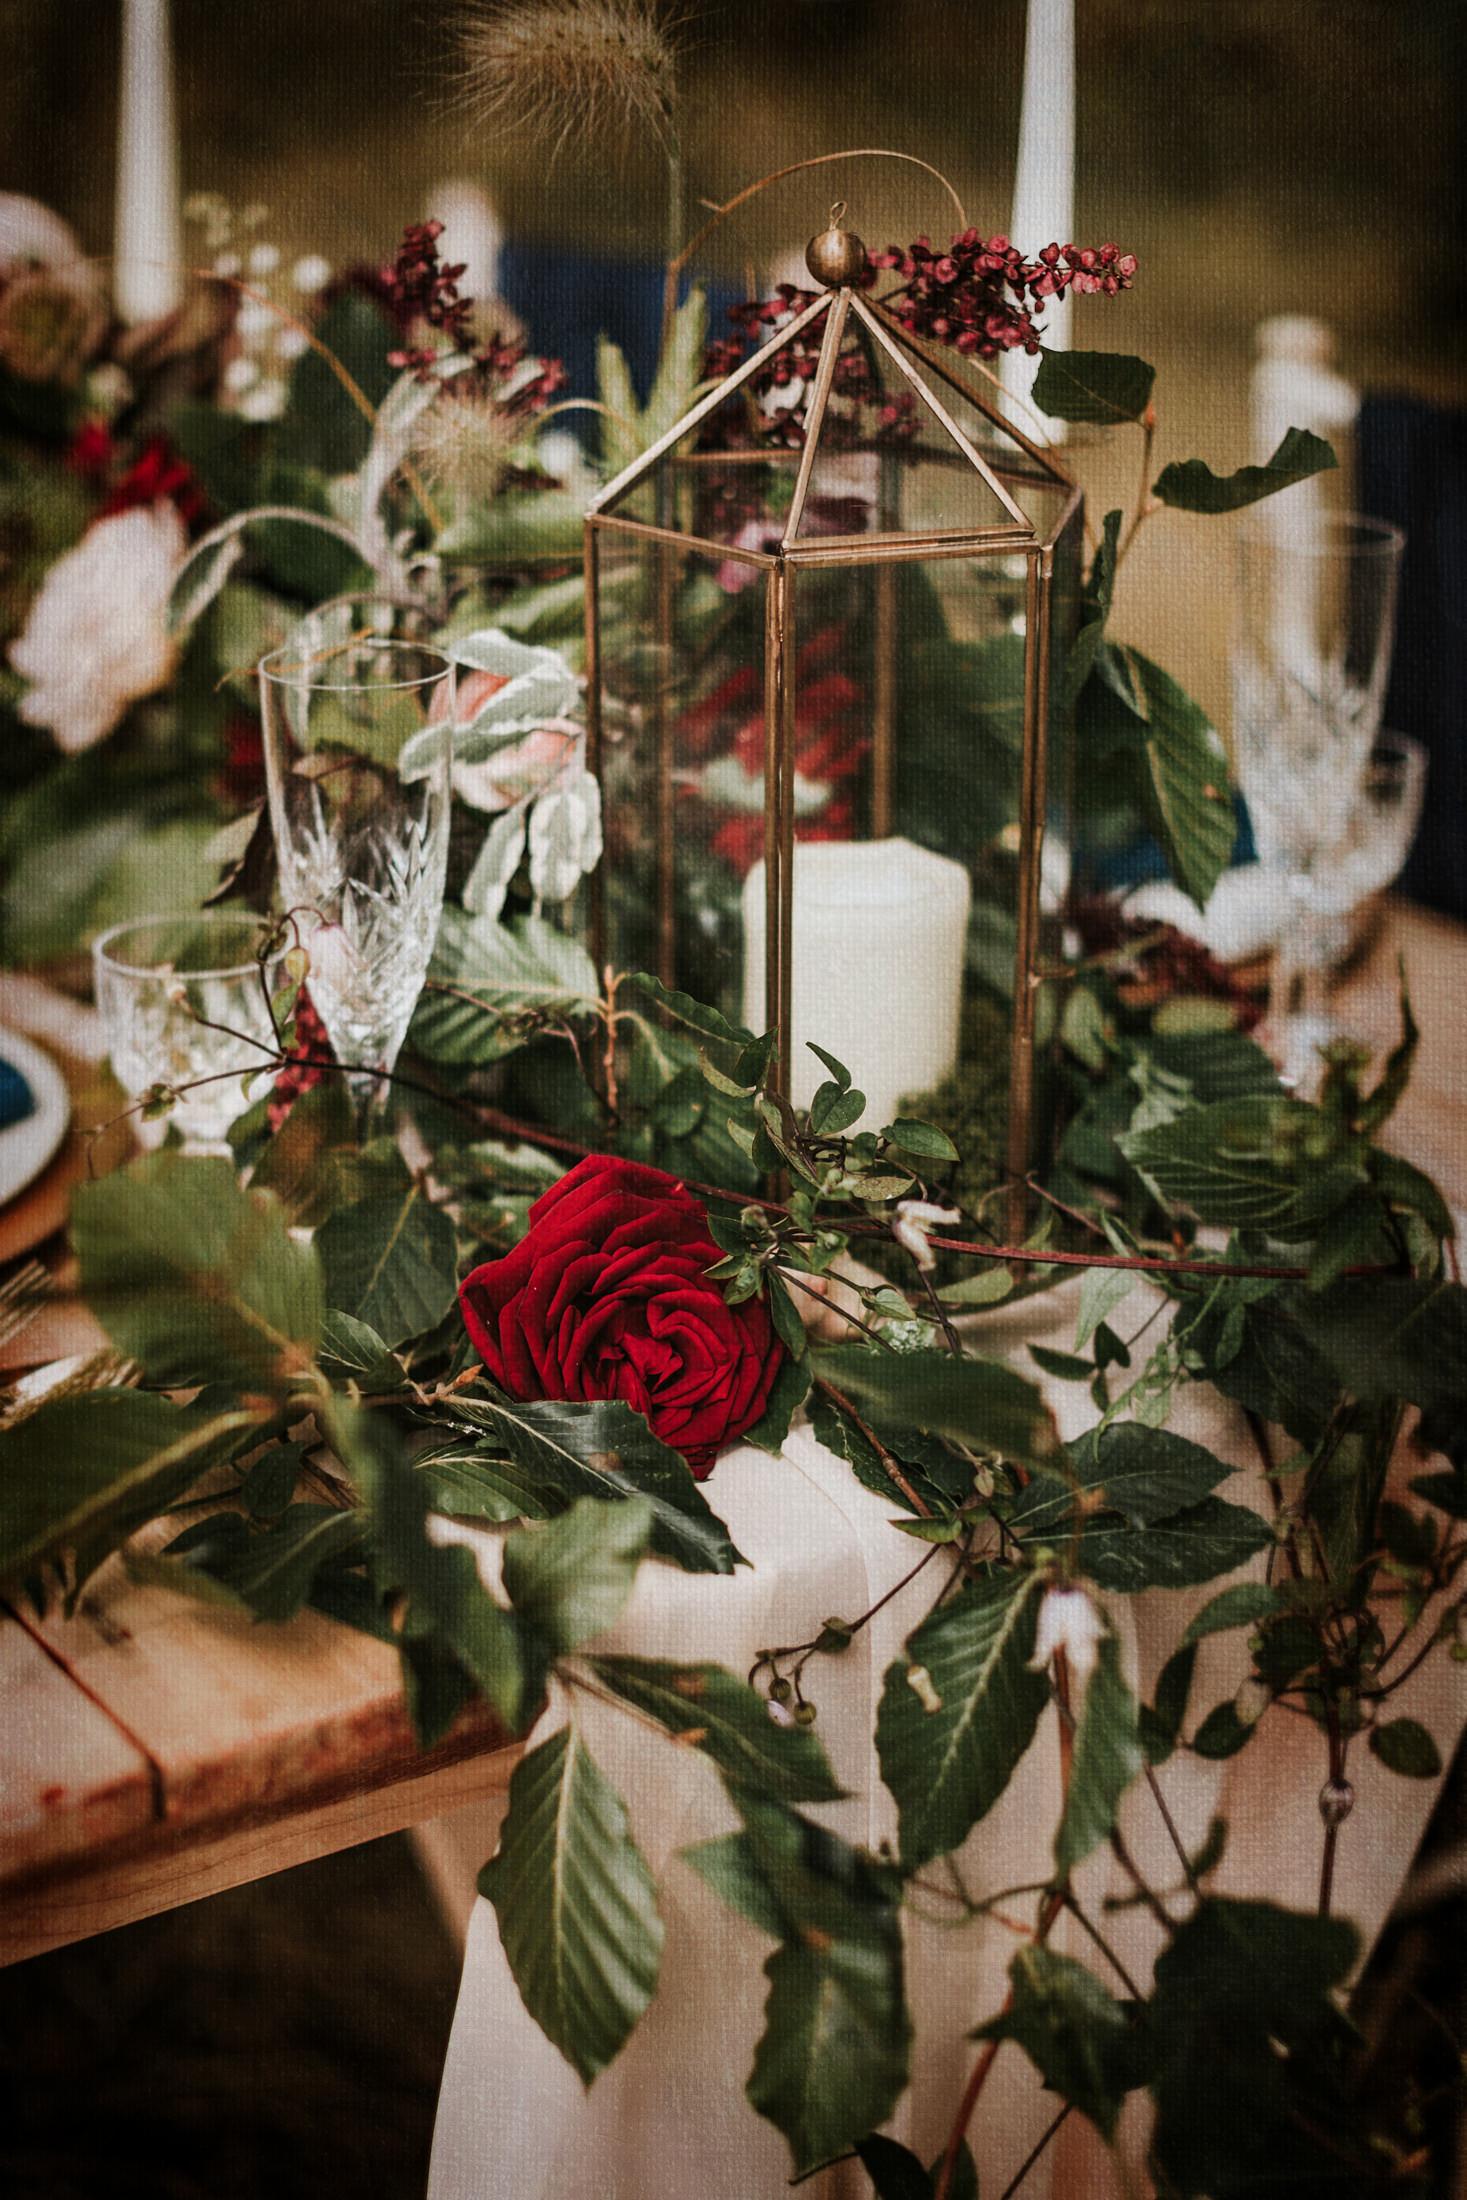 Woodland Wedding - nottingham outdoor wedding venue - east midlands wedding planner - opulent wedding flowers - luxurious wedding table styling